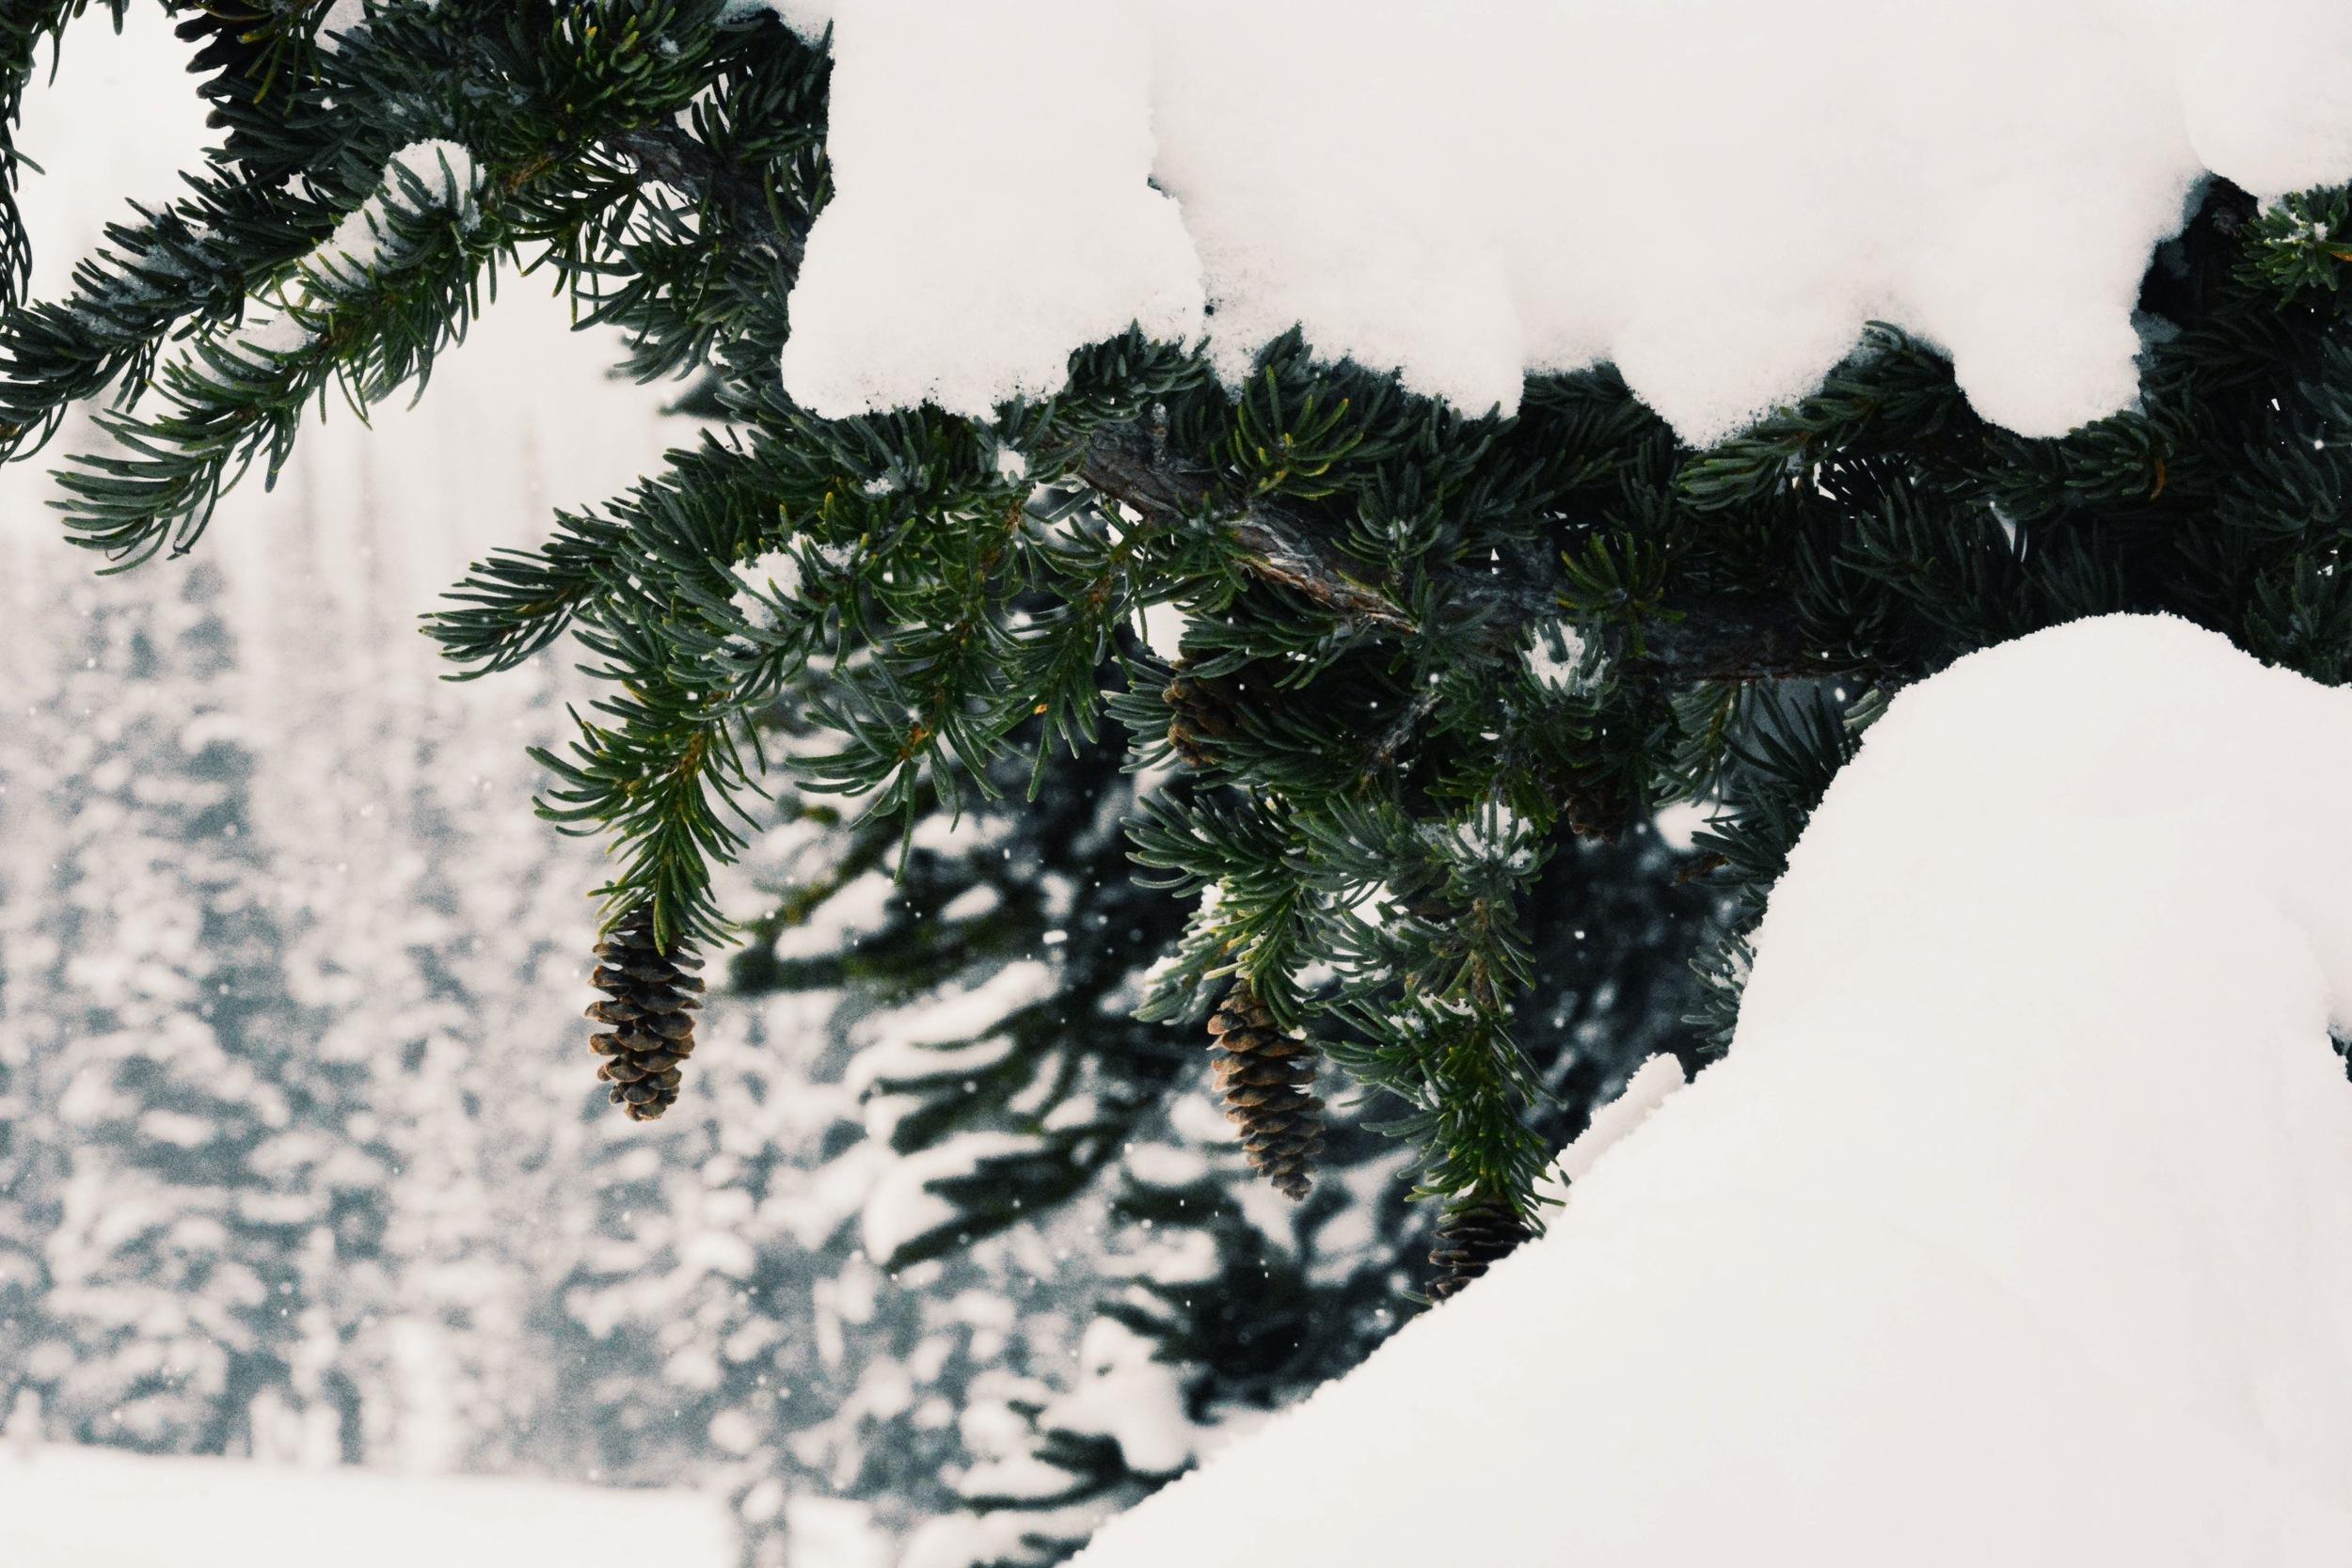 Snow-draped Evergreens in Whistler's Symphony Amphetheatre